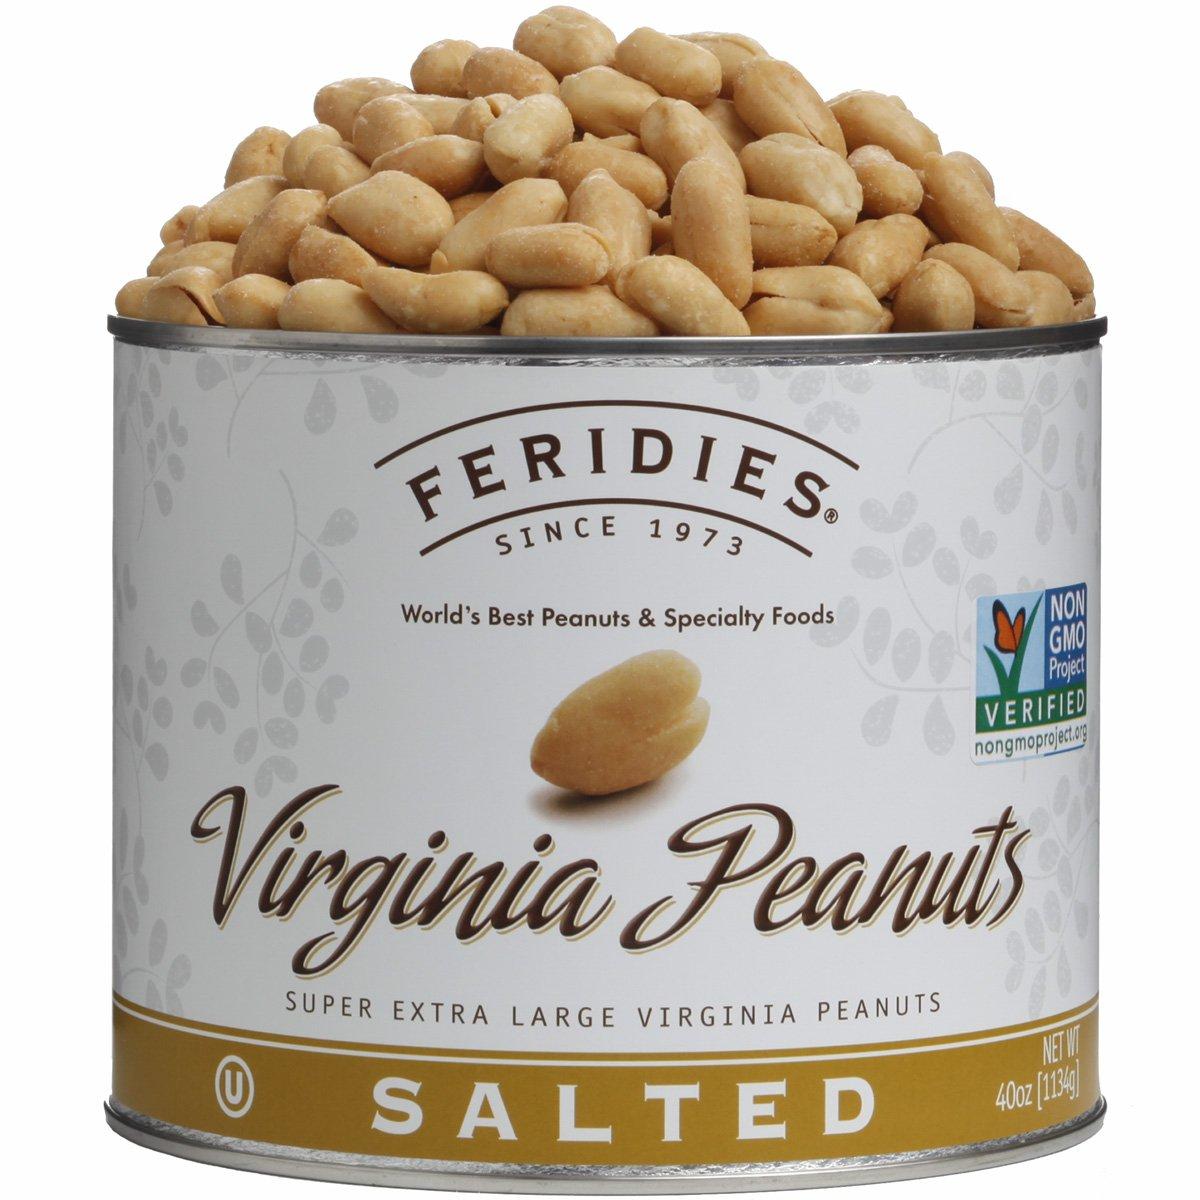 FERIDIES Salted Super Extra Large Virginia Peanuts - 40oz Tin, NonGMO, OU Kosher, Cholesterol Free by FERIDIES